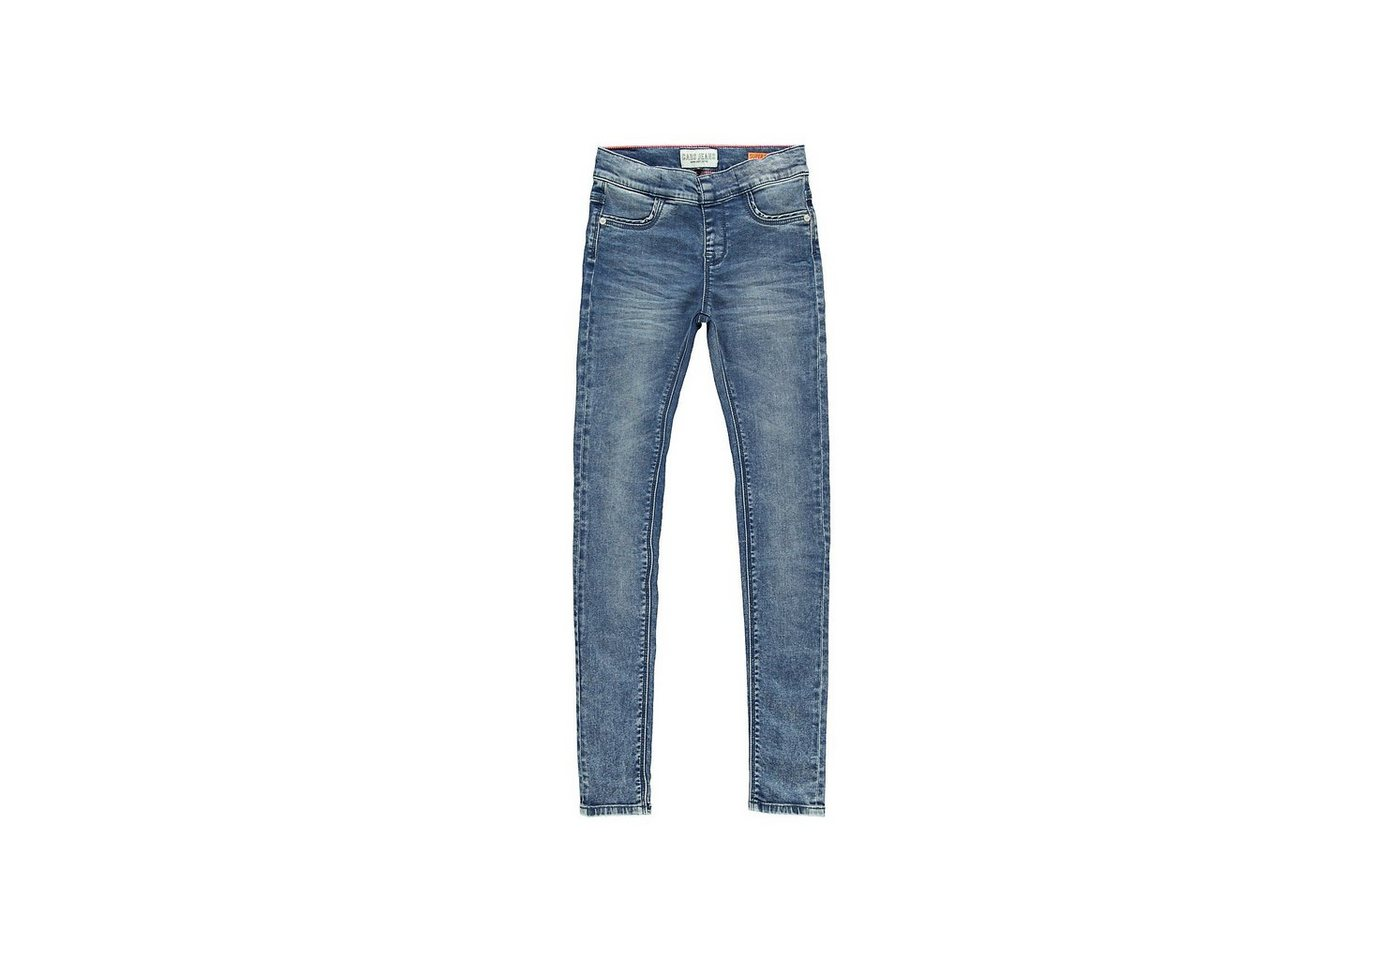 cars jeans -  Jeggings Aarlyn Super Skinny für Mädchen